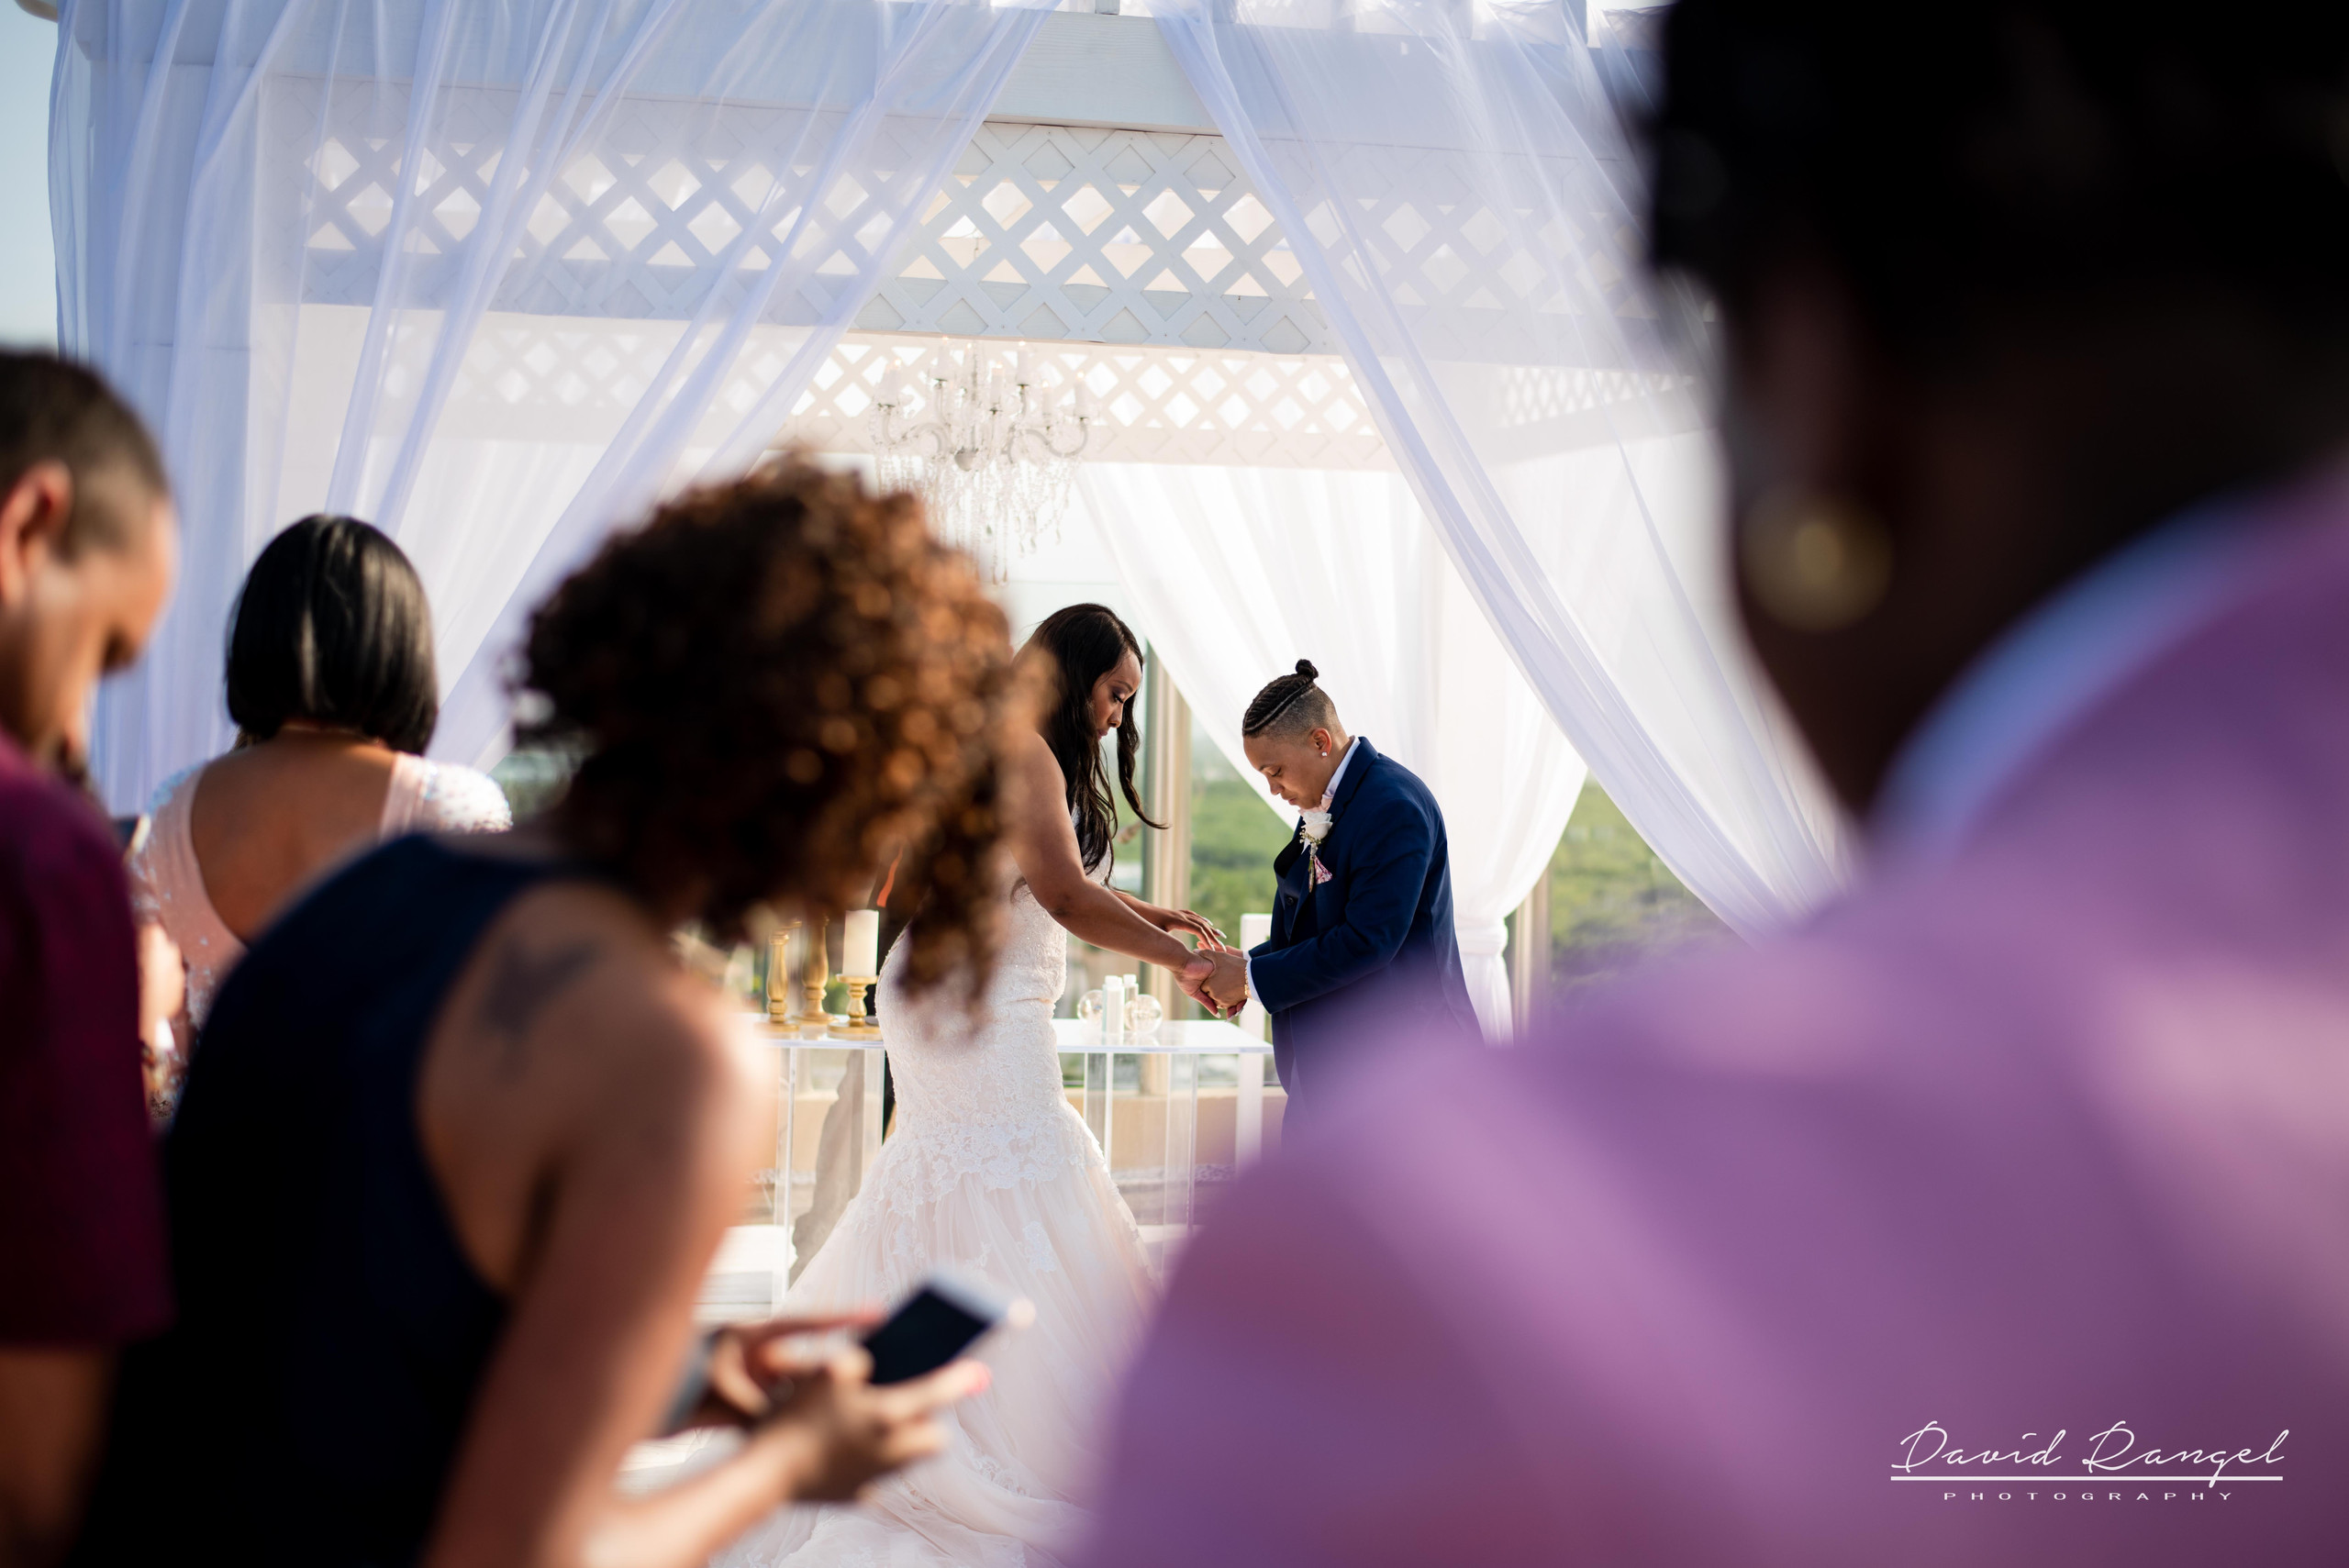 wedding+ceremony+pray+ss+gay+marriage